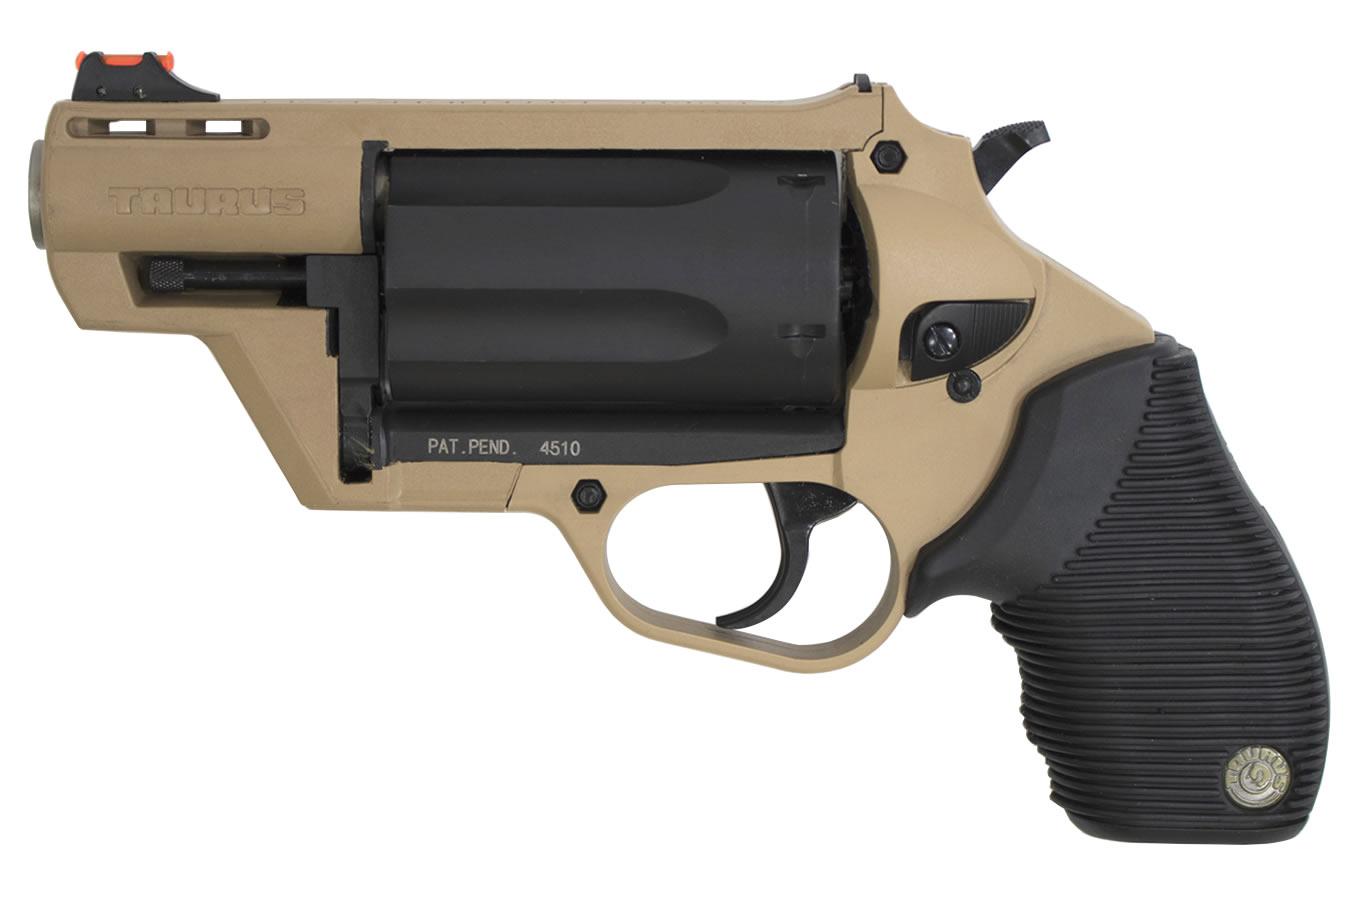 Judge Public Defender Poly 45/410 Flat Dark Earth Polymer Frame Revolver